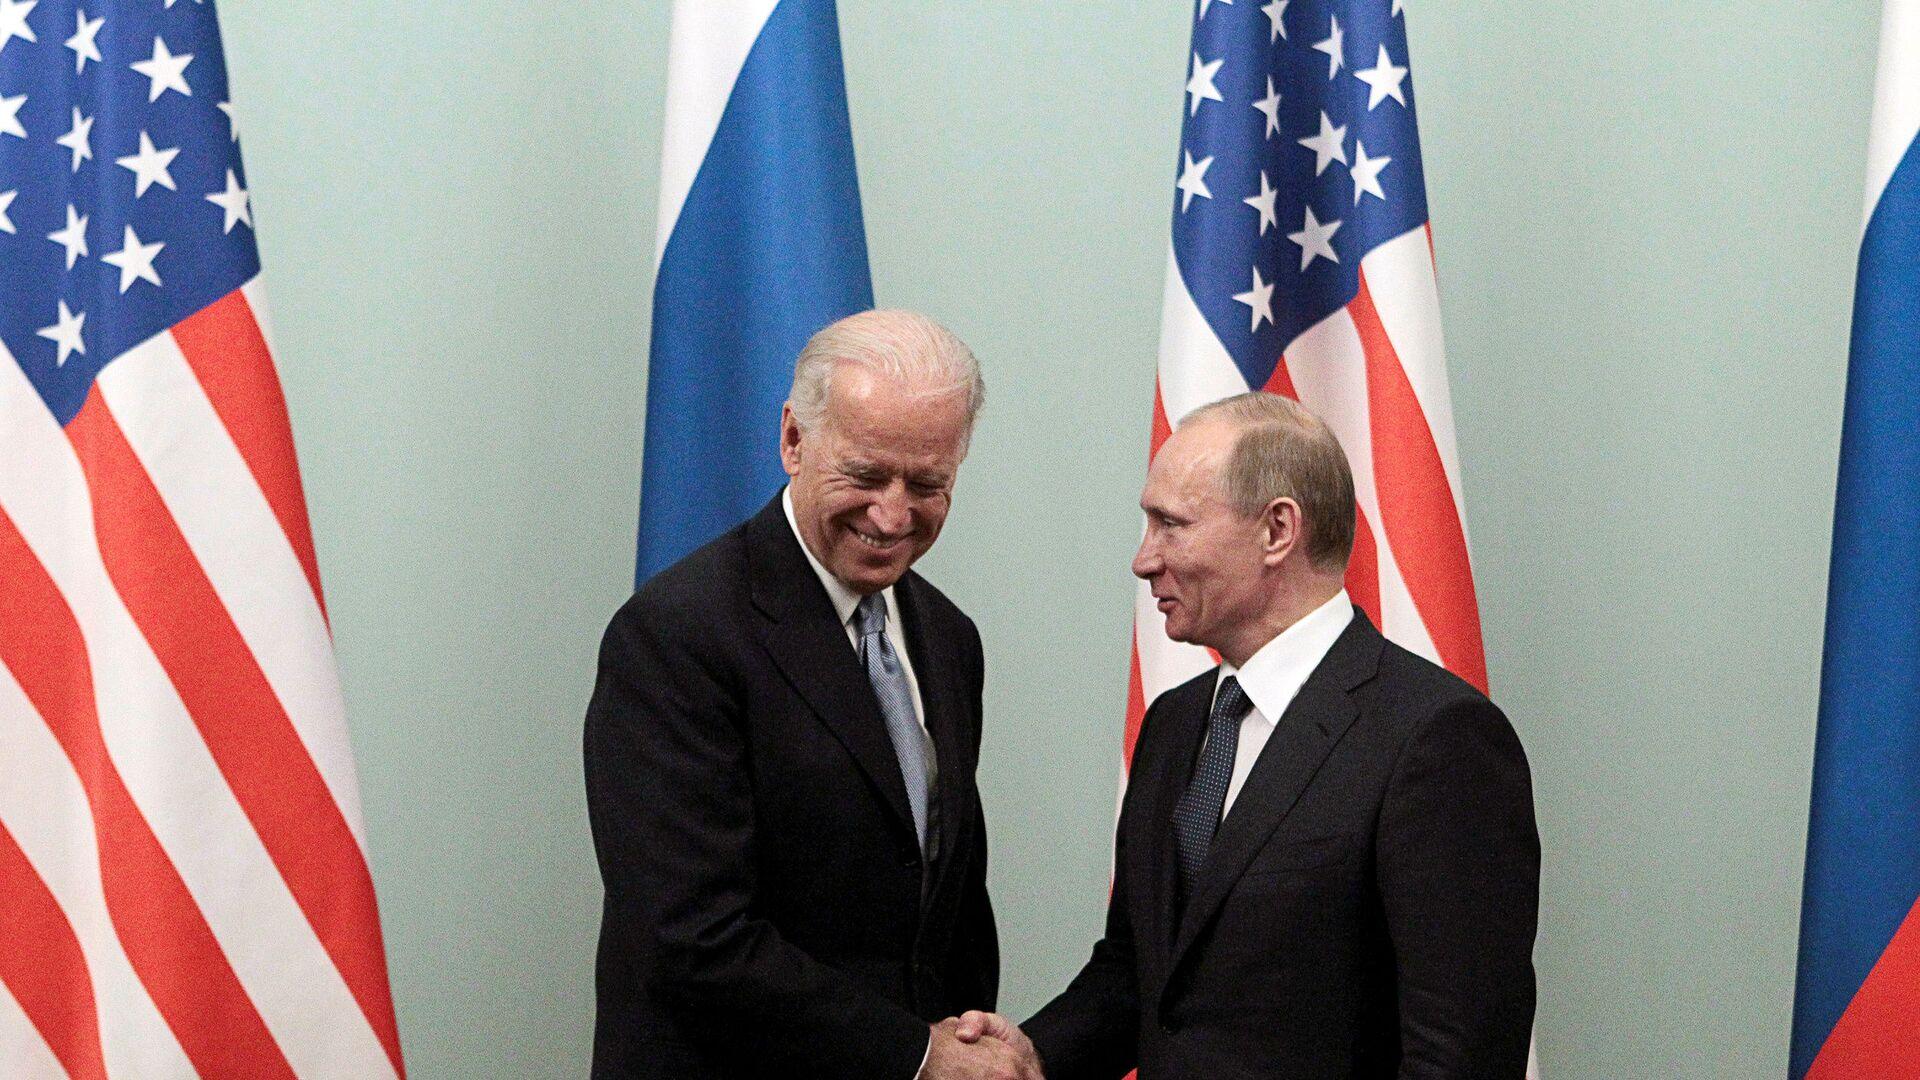 Vladímir Putin y Joe Biden (archivo, 2011) - Sputnik Mundo, 1920, 13.04.2021